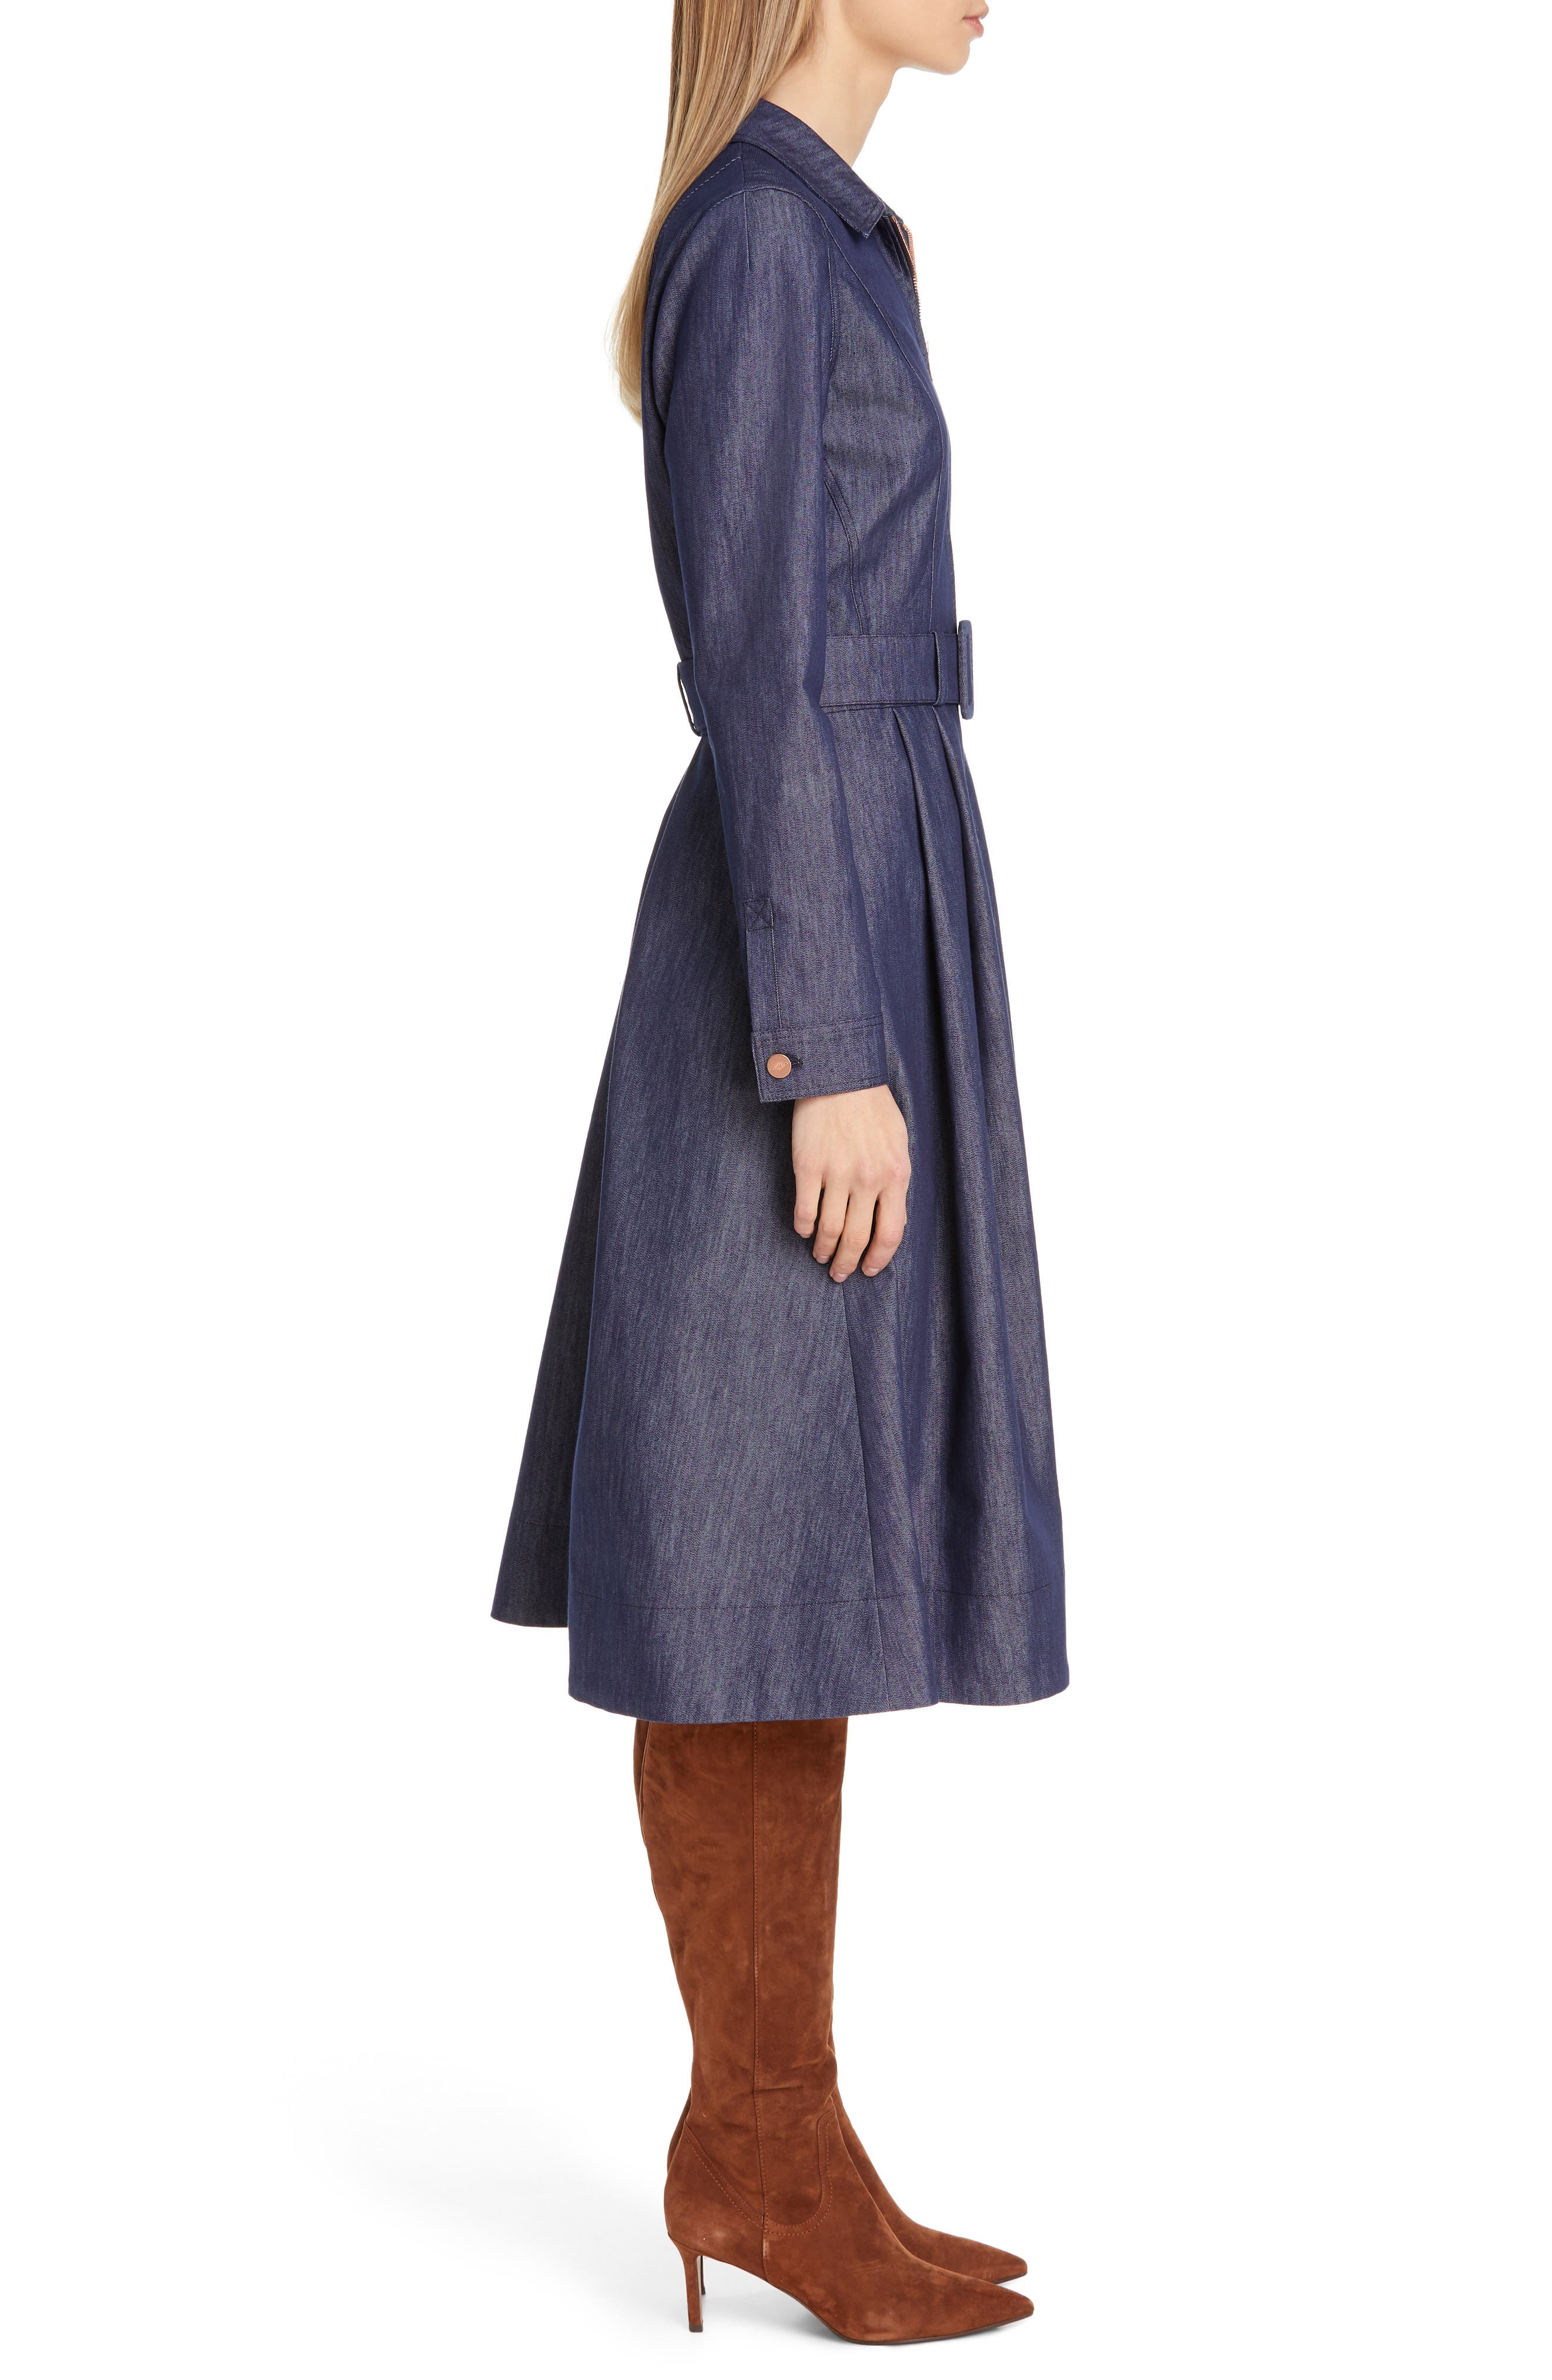 TOMMY X ZENDAYA, Belted Denim Dress, Alternate thumbnail 3, color, DENIM BLUE